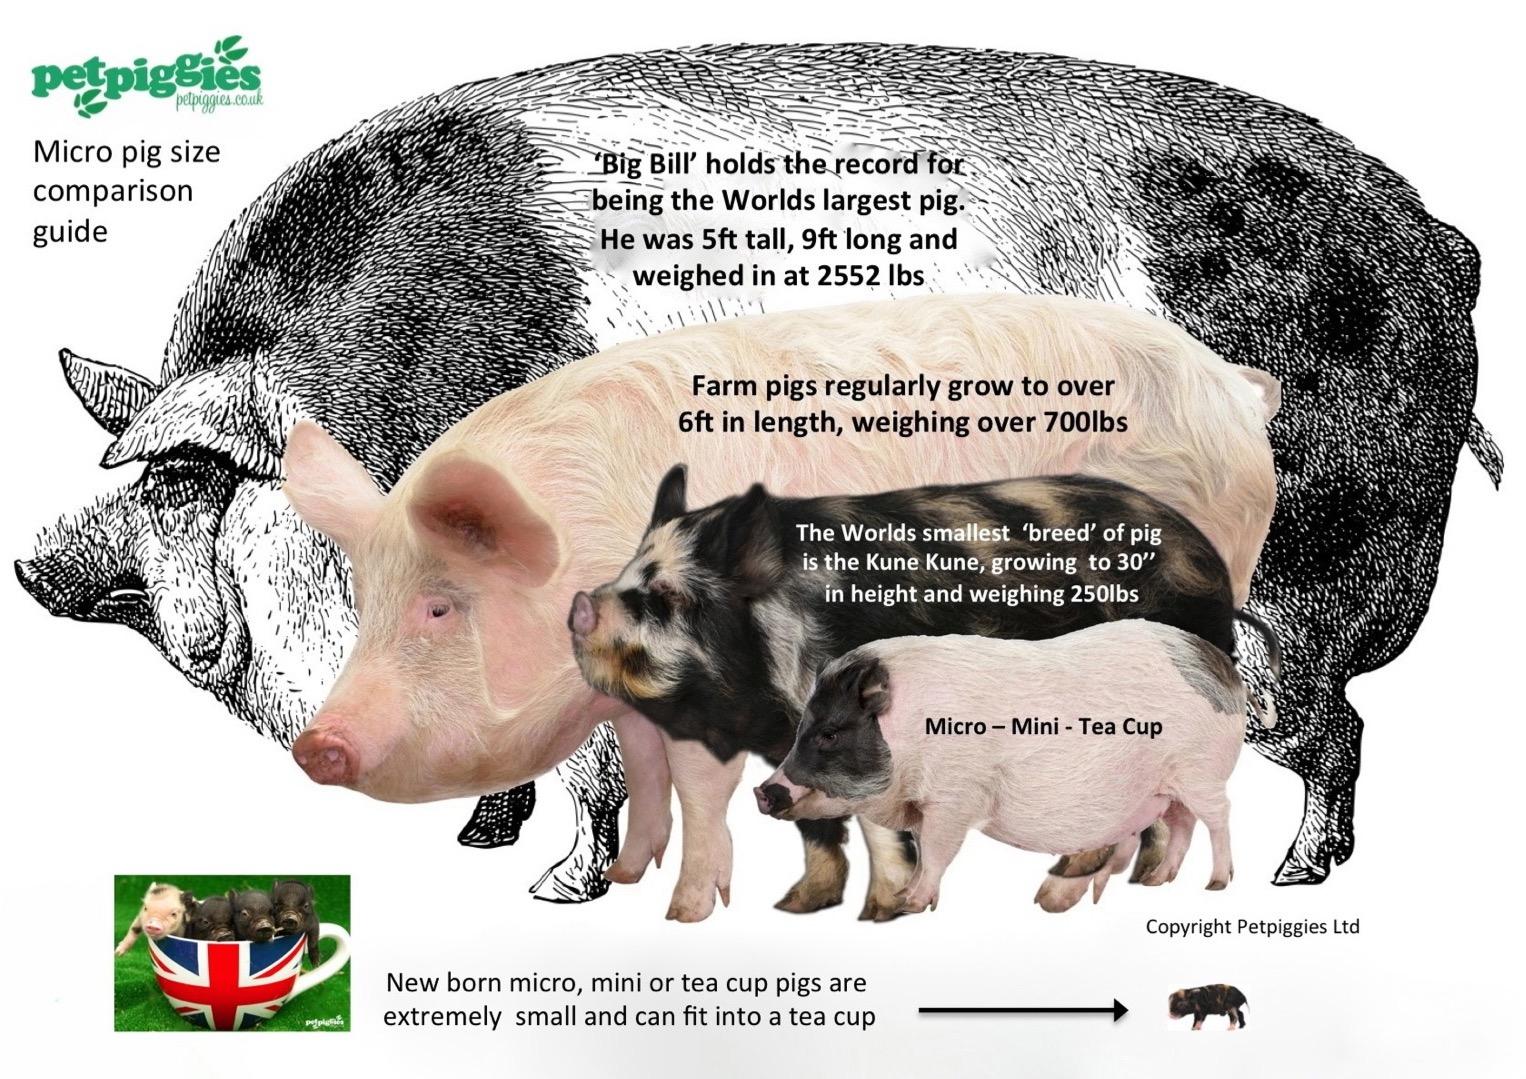 How big do micro pigs get?